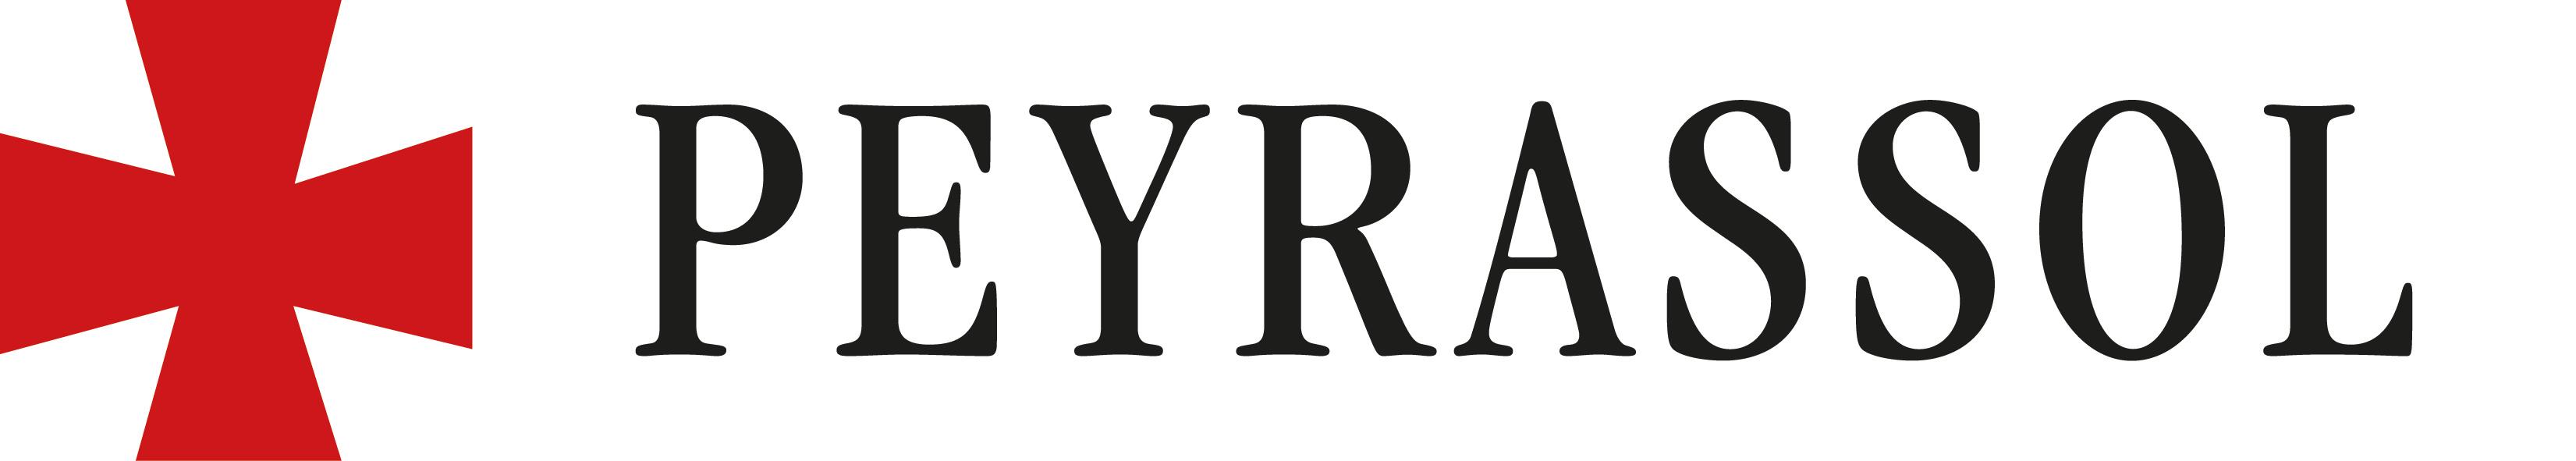 PEYRASSOL_Croix+Wordmark_CMJN